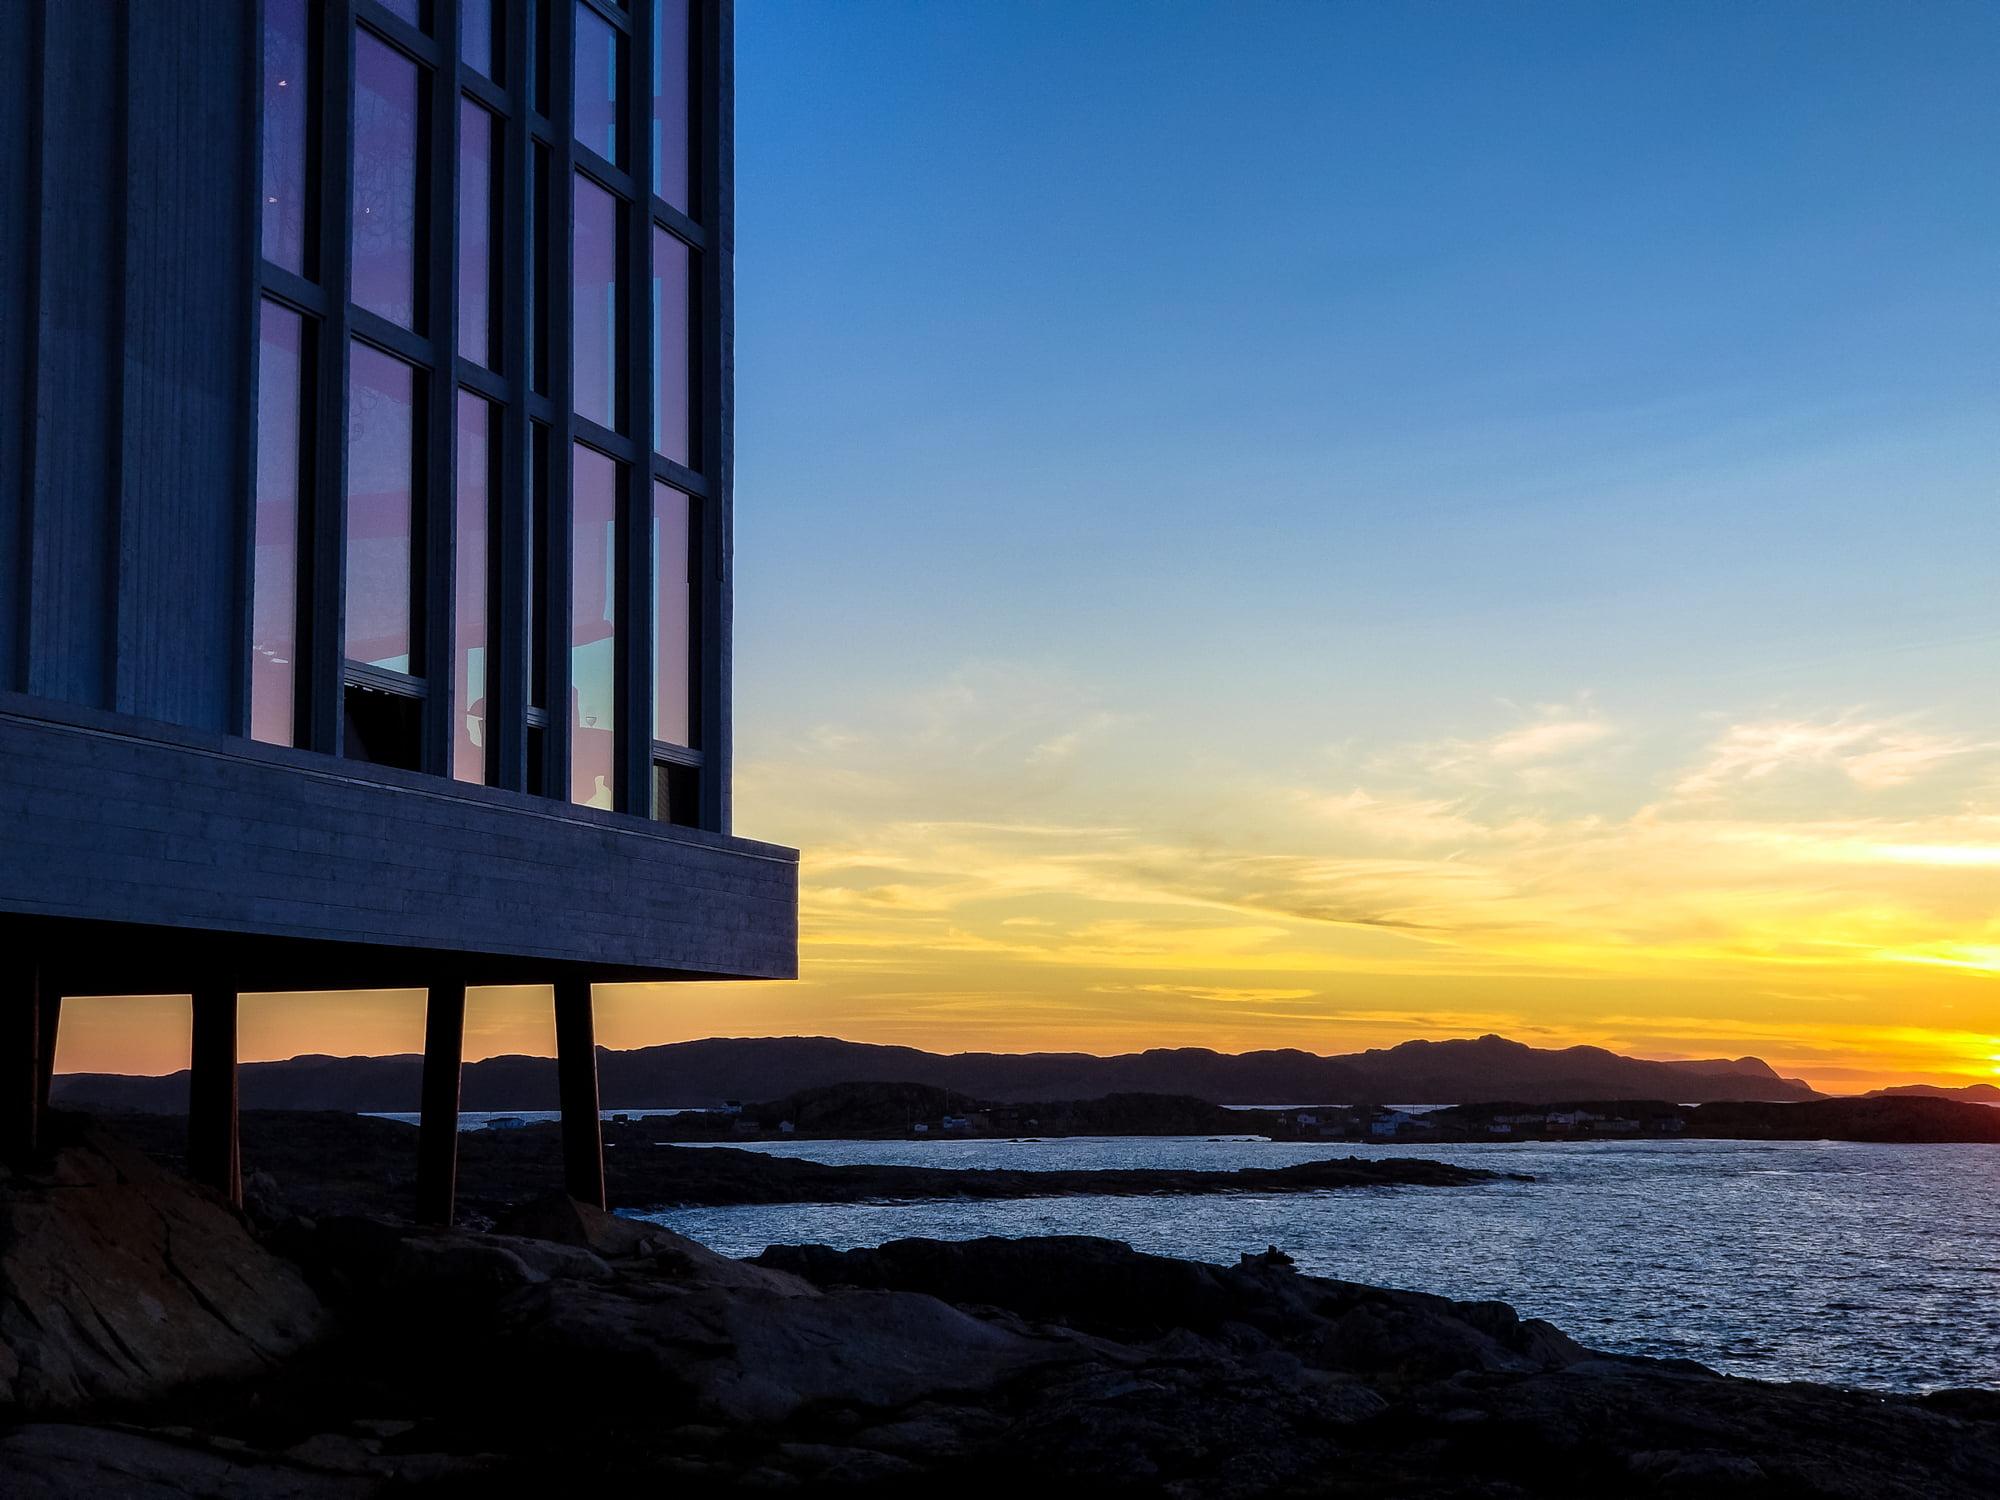 Fogo Island Inn at sunset | Samsung Galaxy Note 8